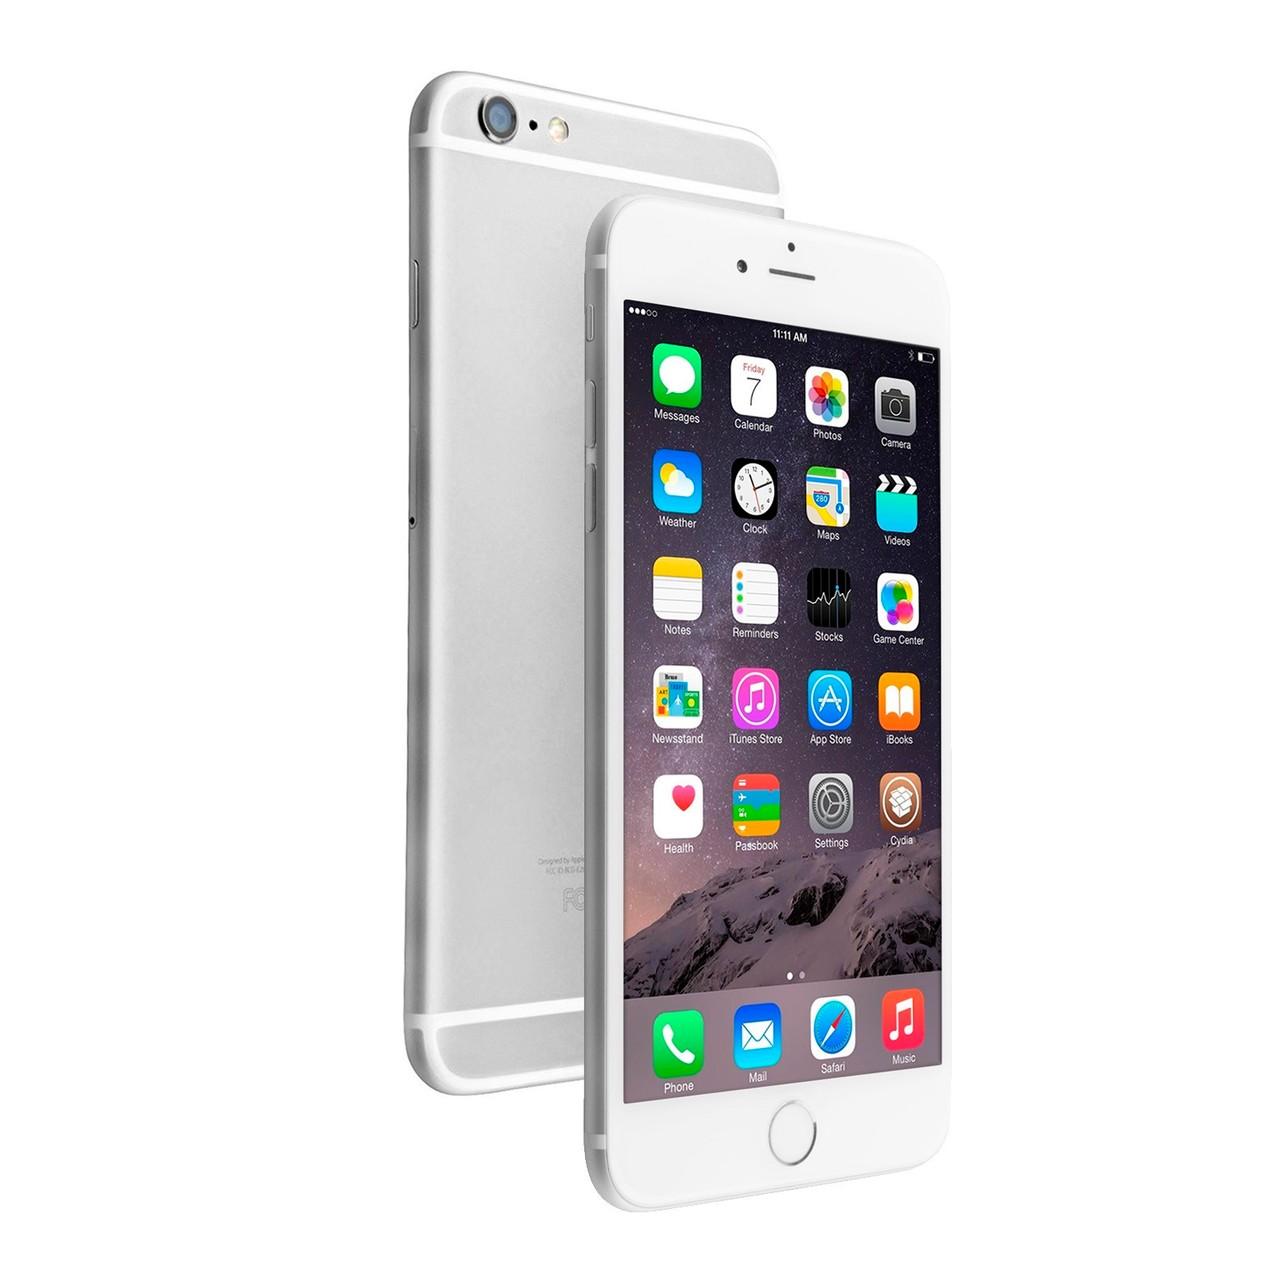 Apple Iphone 6 Plus 16gb Gsm Unlocked Smartphone Tanga